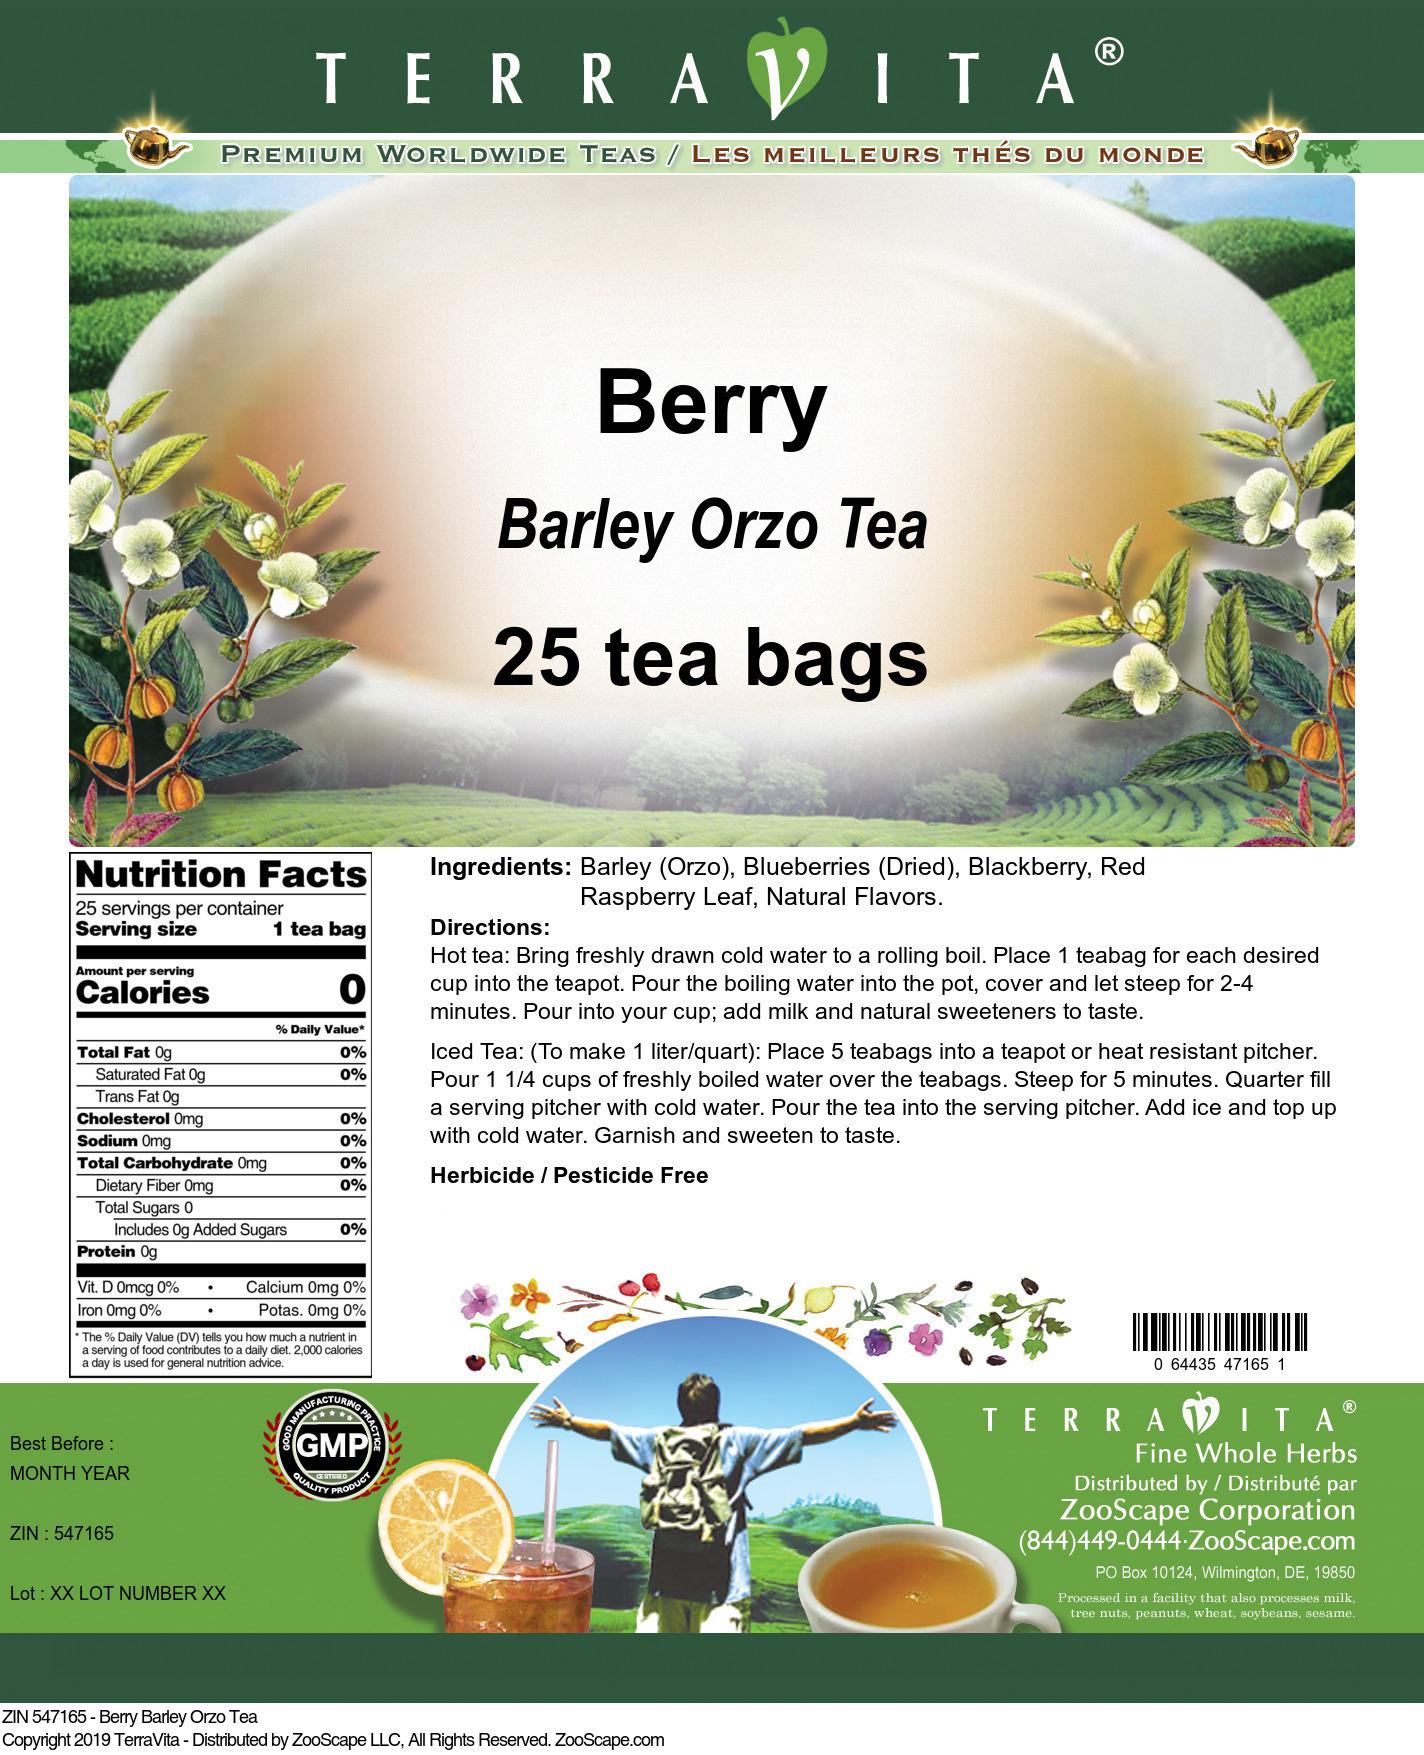 Berry Barley Orzo Tea